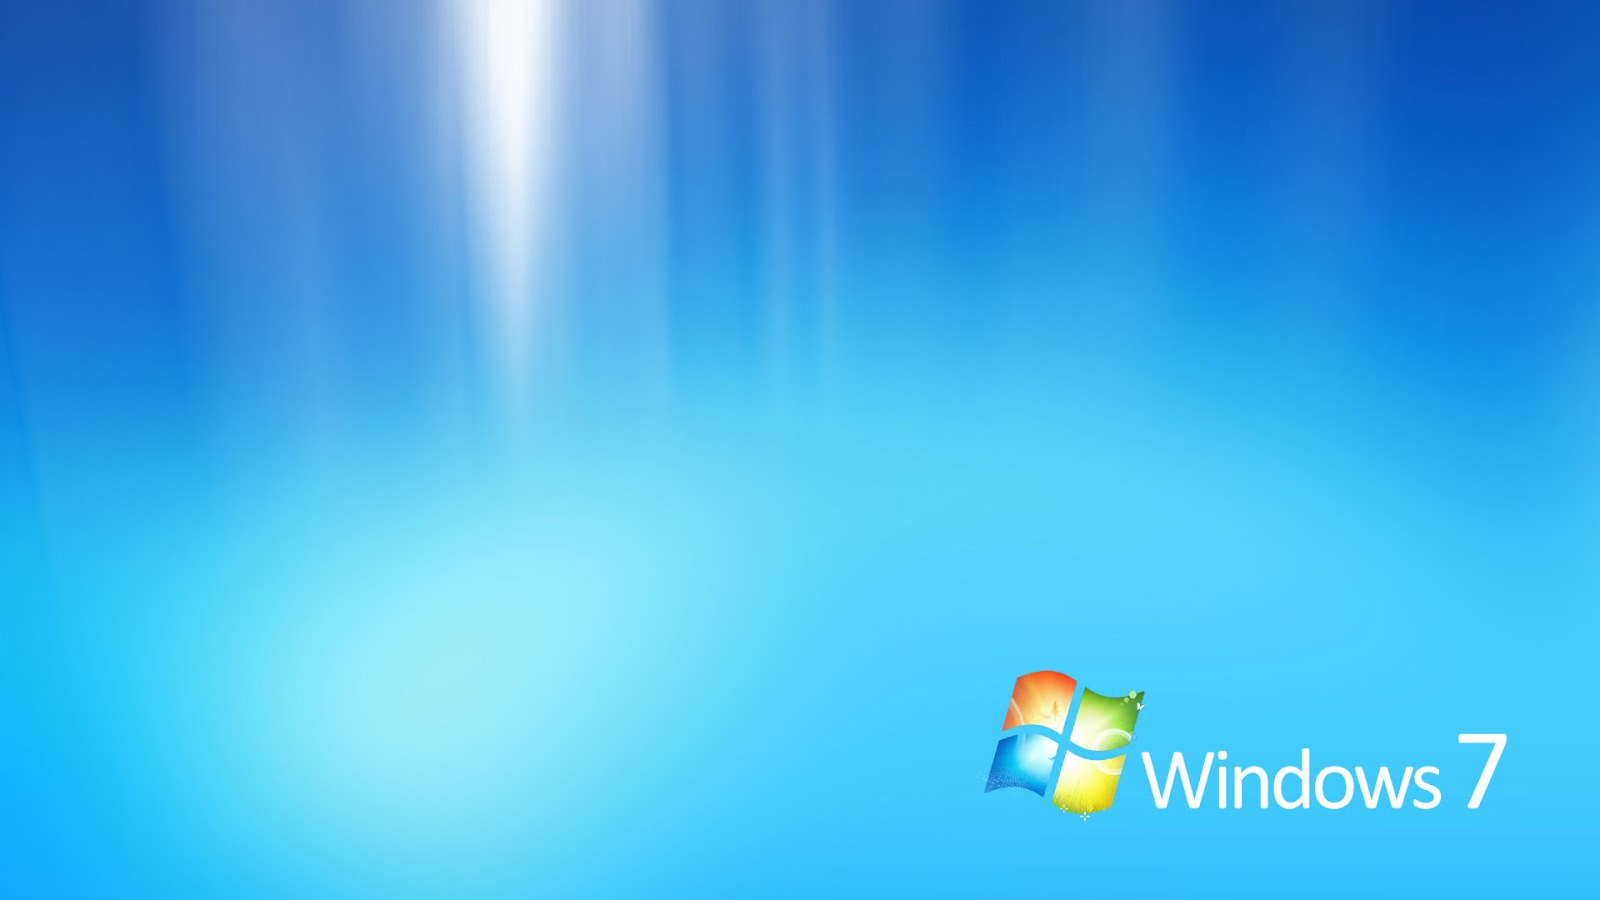 Default Windows 7 Bed Mattress Sale 1600x1000 Download Resolutions Desktop 1600x900 1536x864 1440x900 1366x768